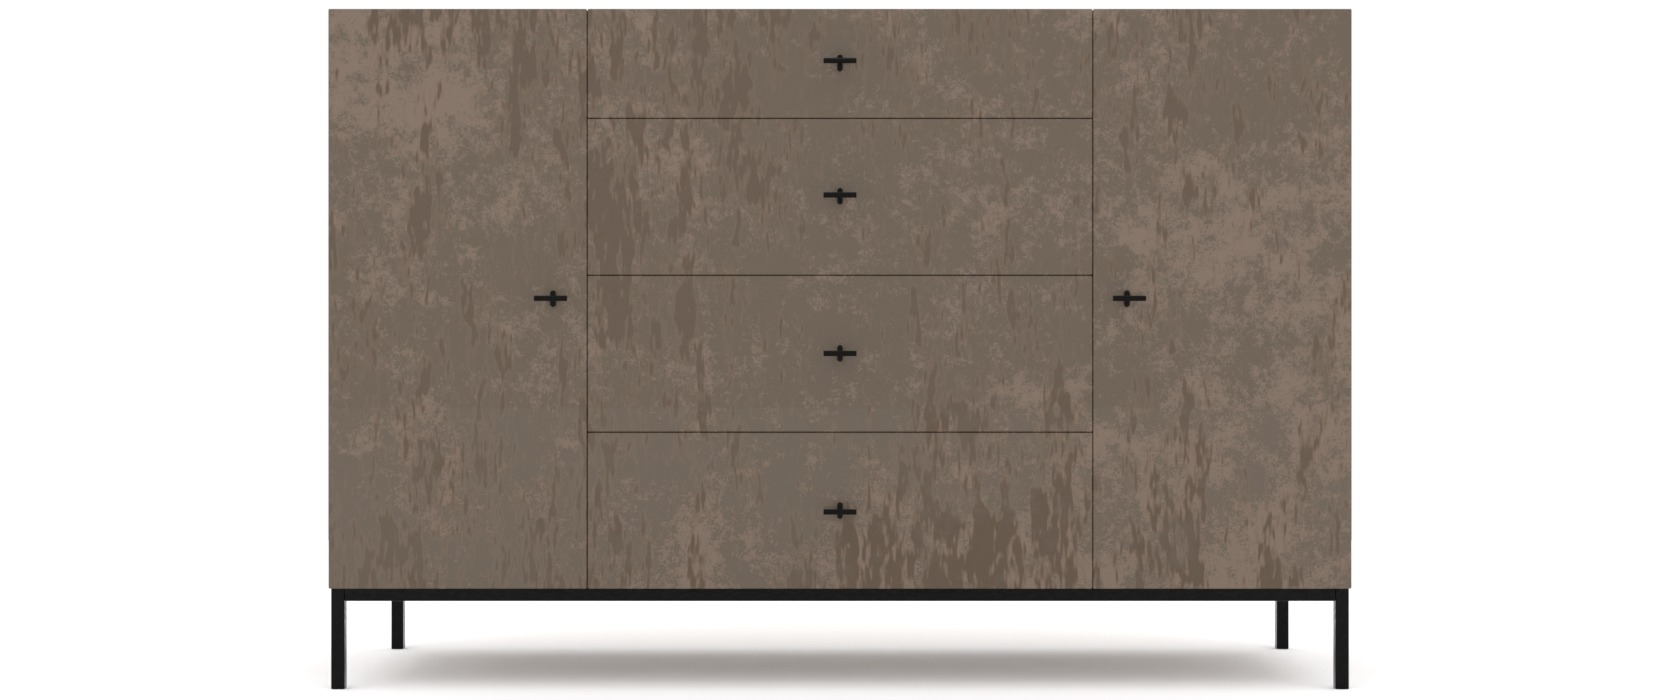 Комод Rollini з 4 ящиками і 2 дверцятами - Pufetto